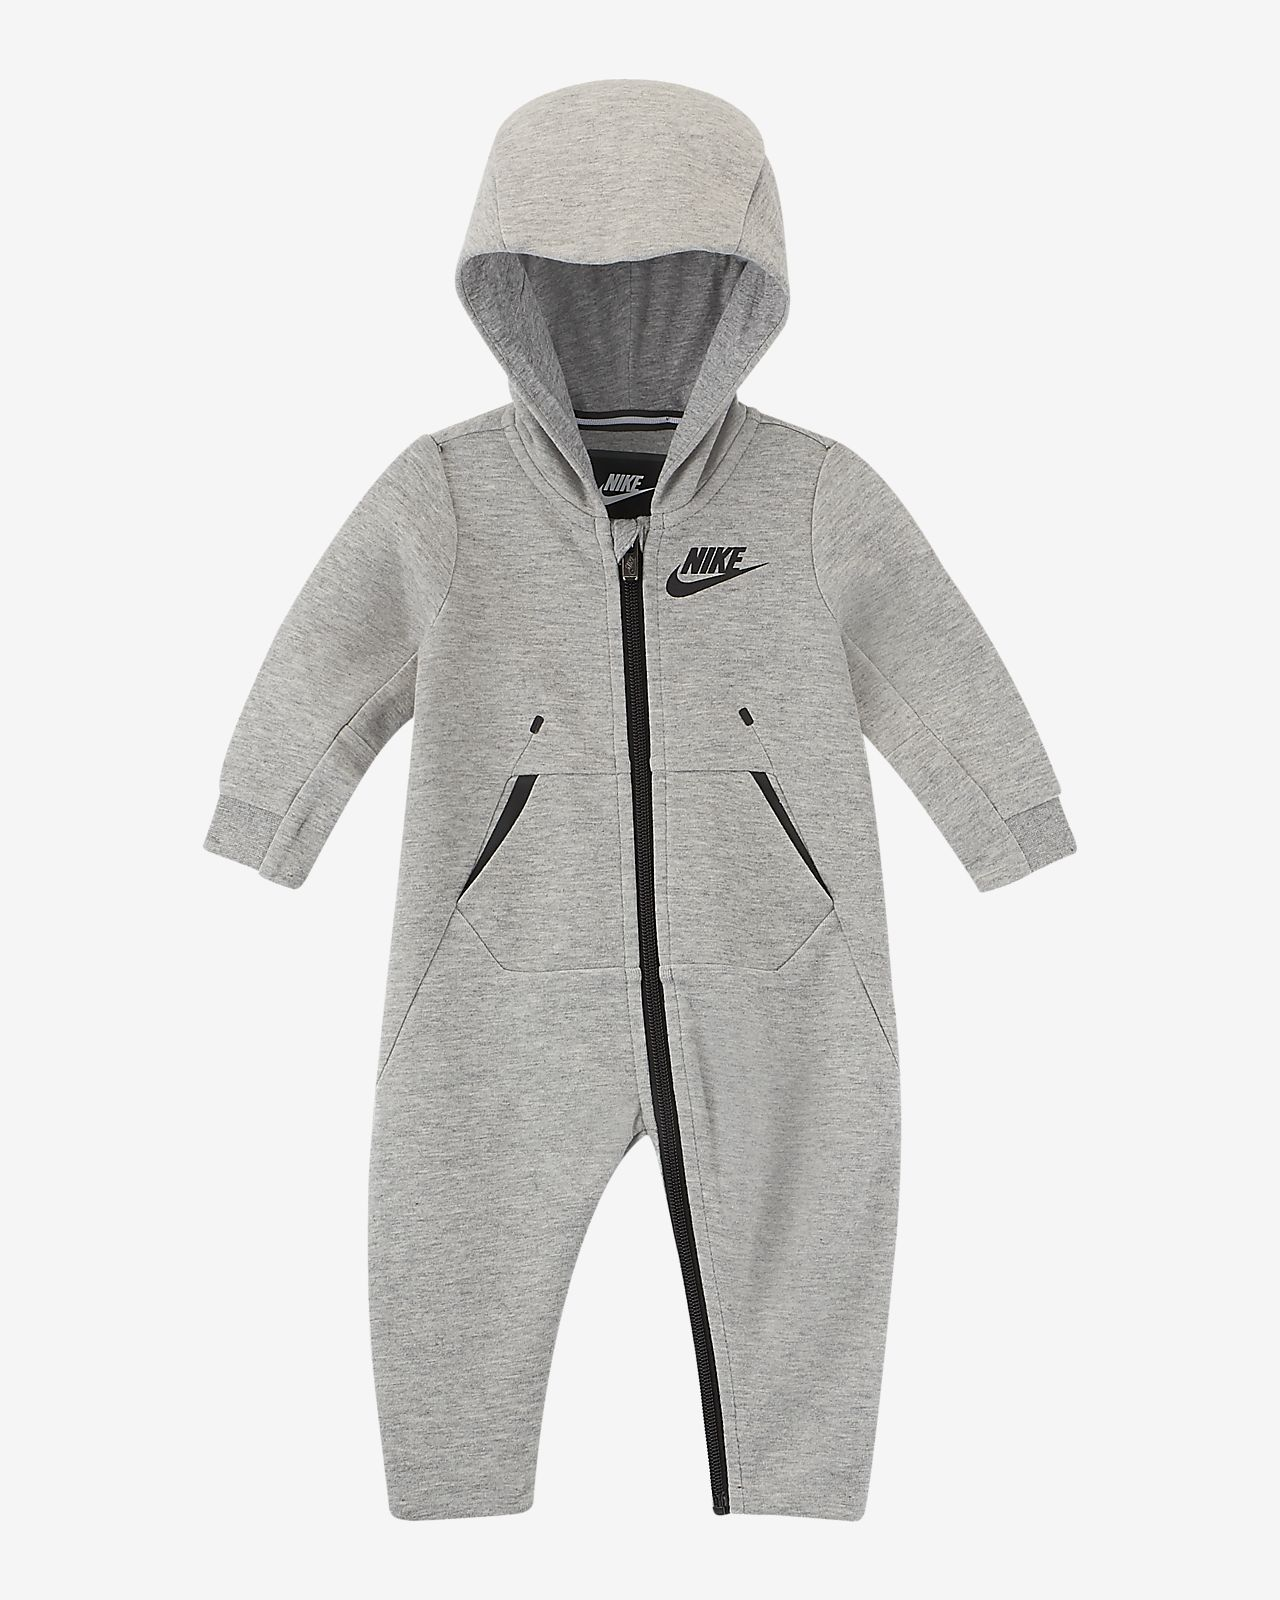 Nike Sportswear Tech Fleece Baby & Toddler Hooded Overalls